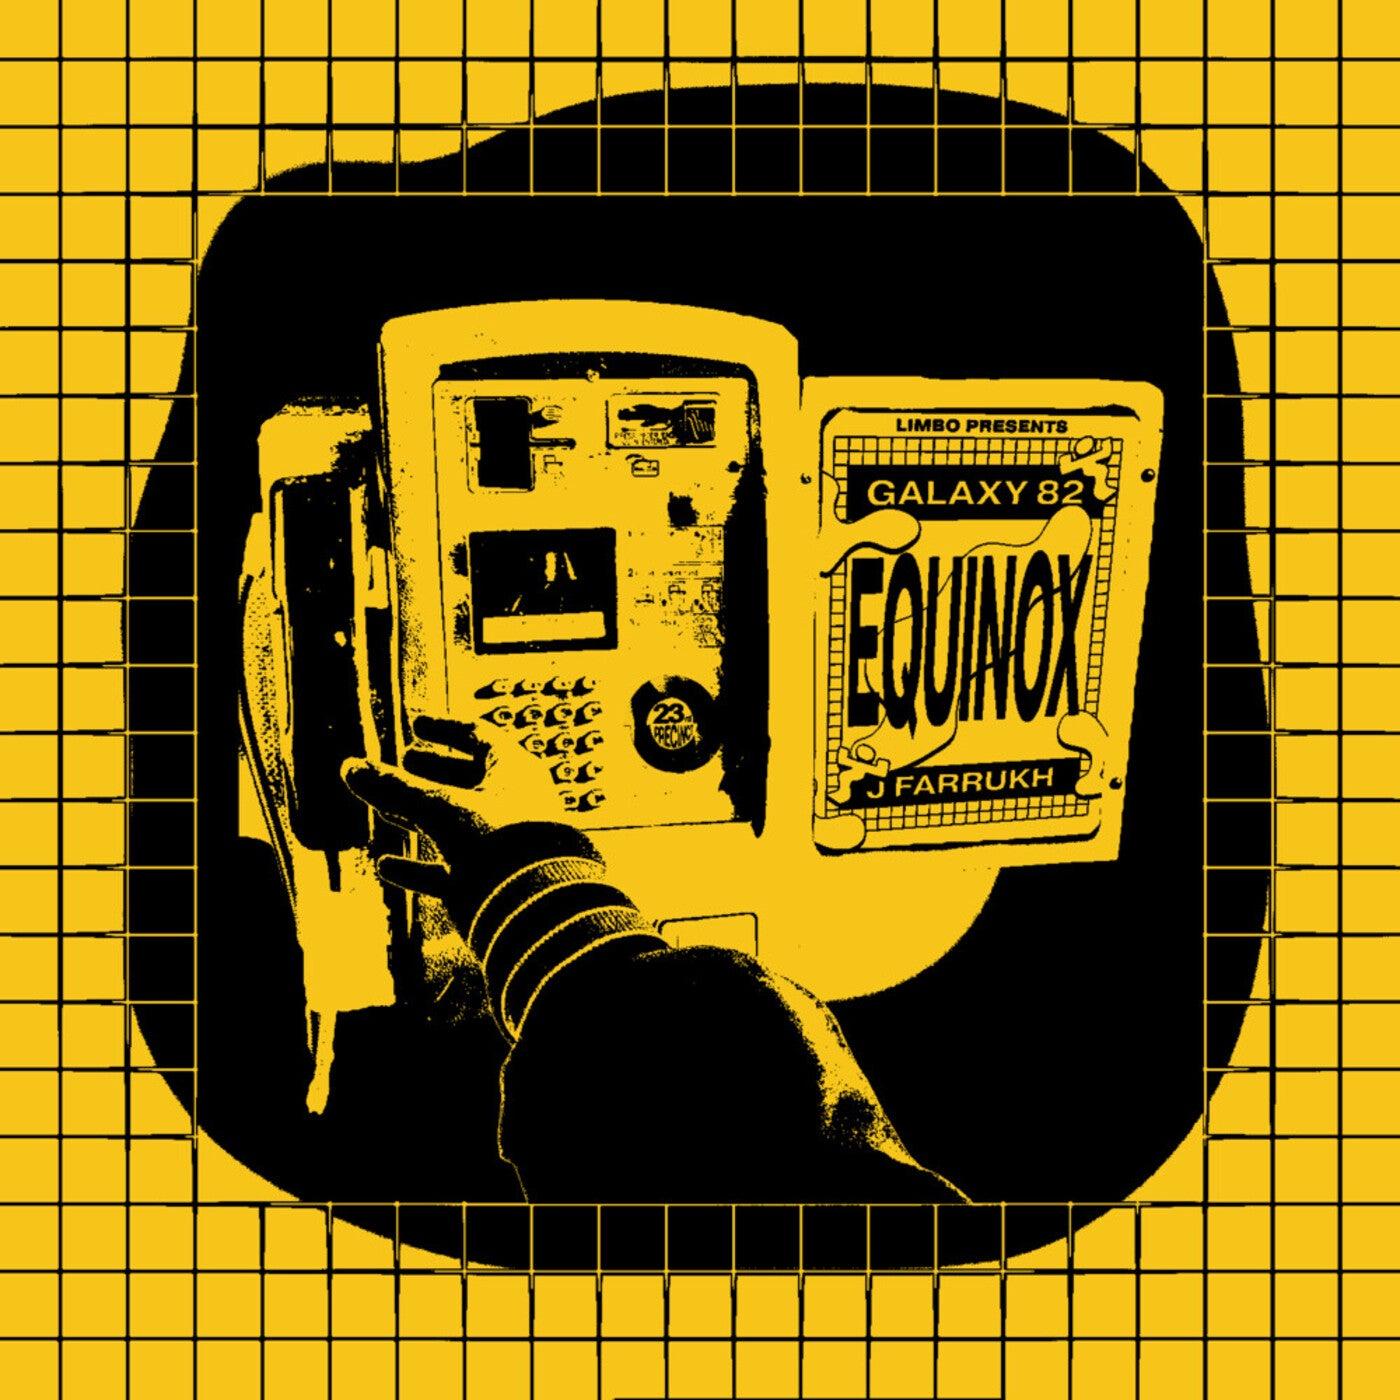 Equinox feat. J Farrukh (Extended Mix)